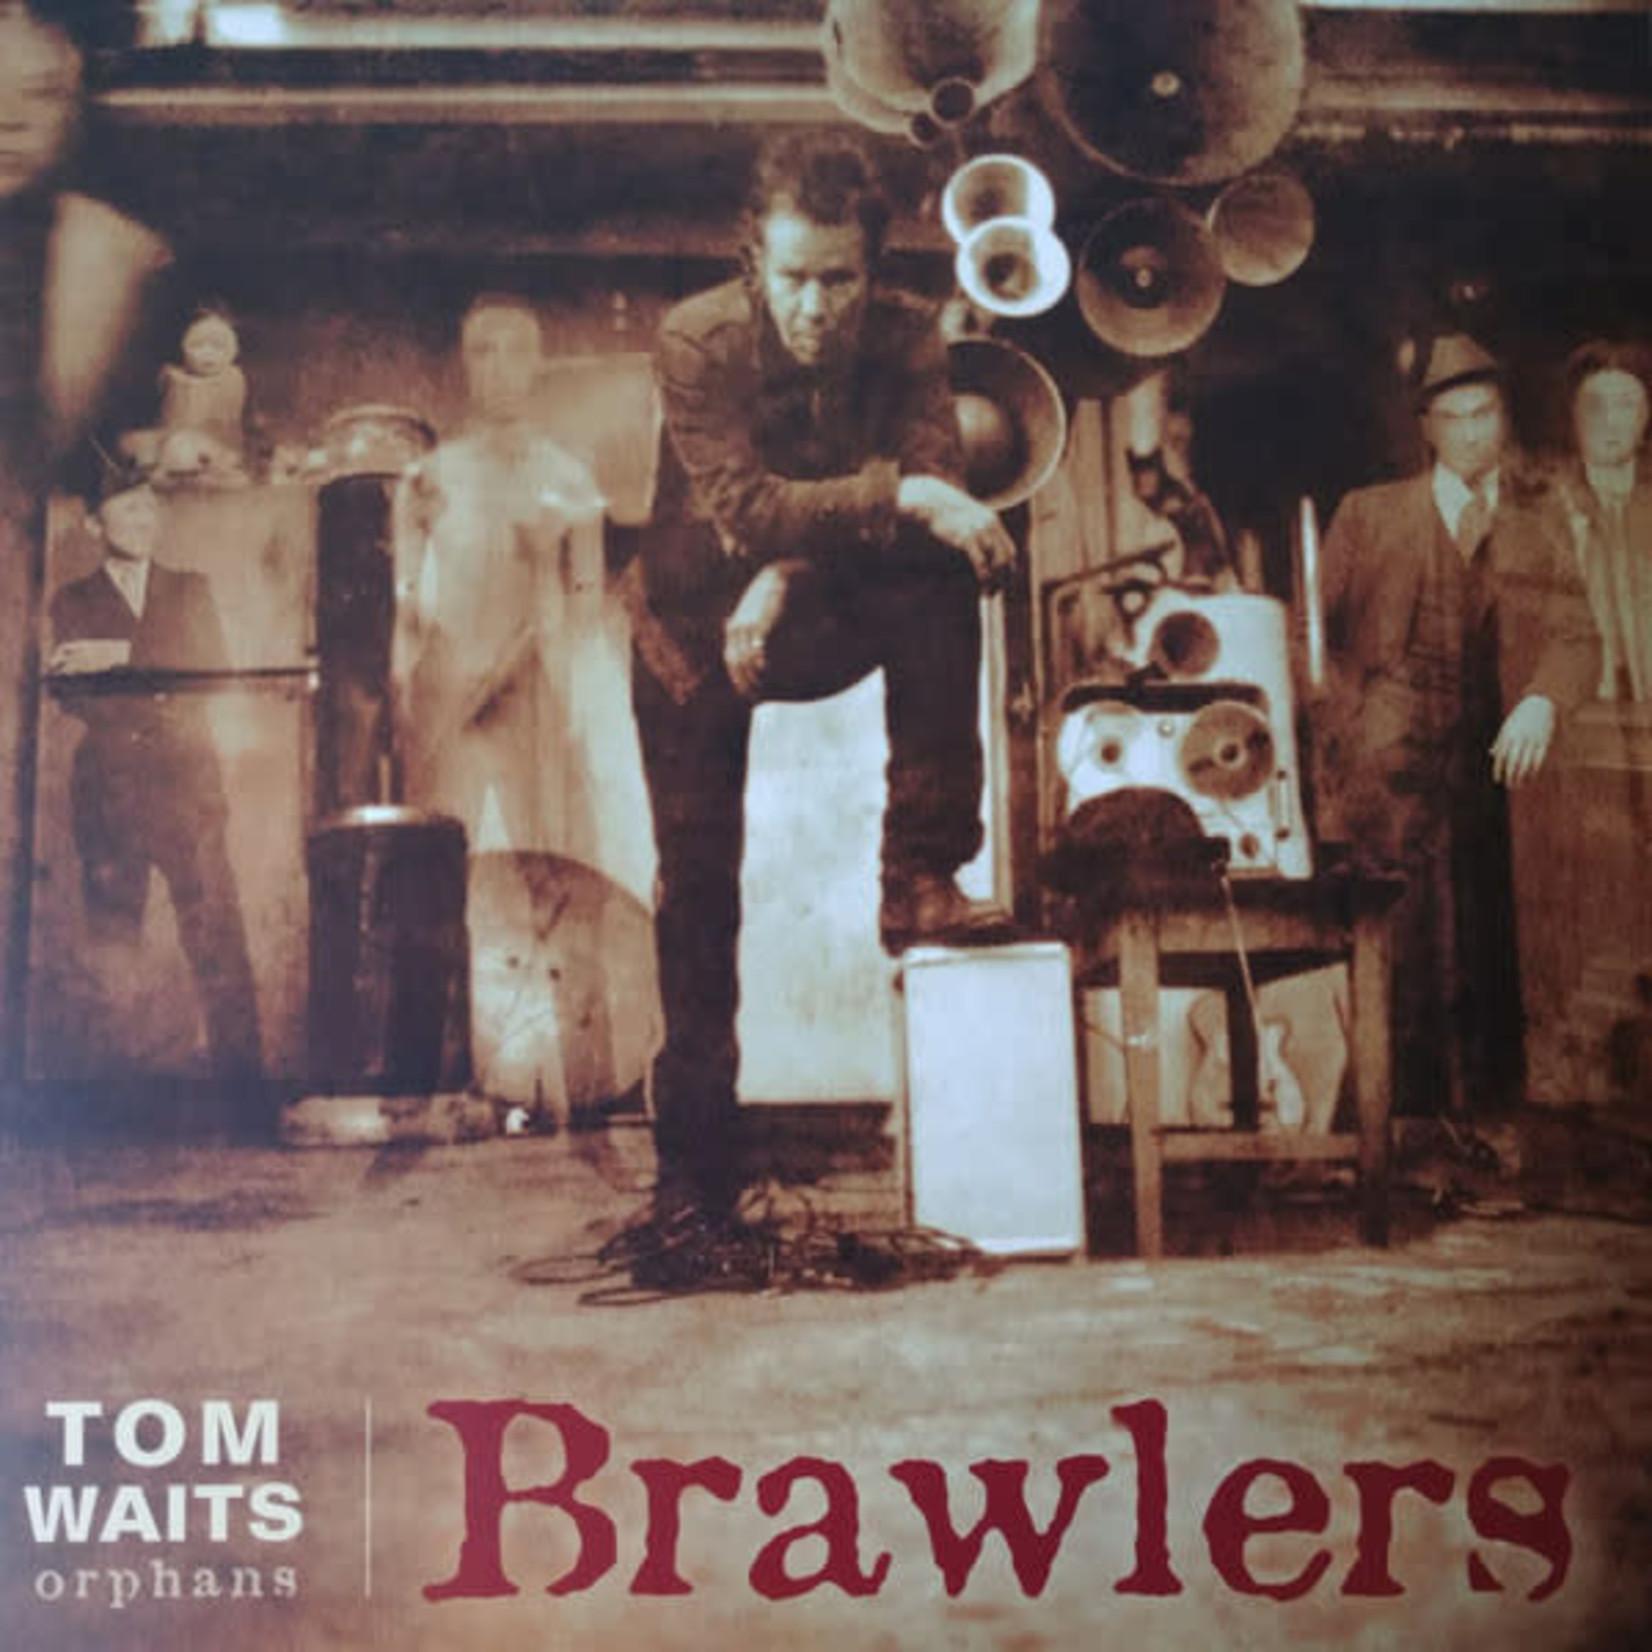 TOM WAITS BRAWLERS  (2LP/BLACK VINYL)